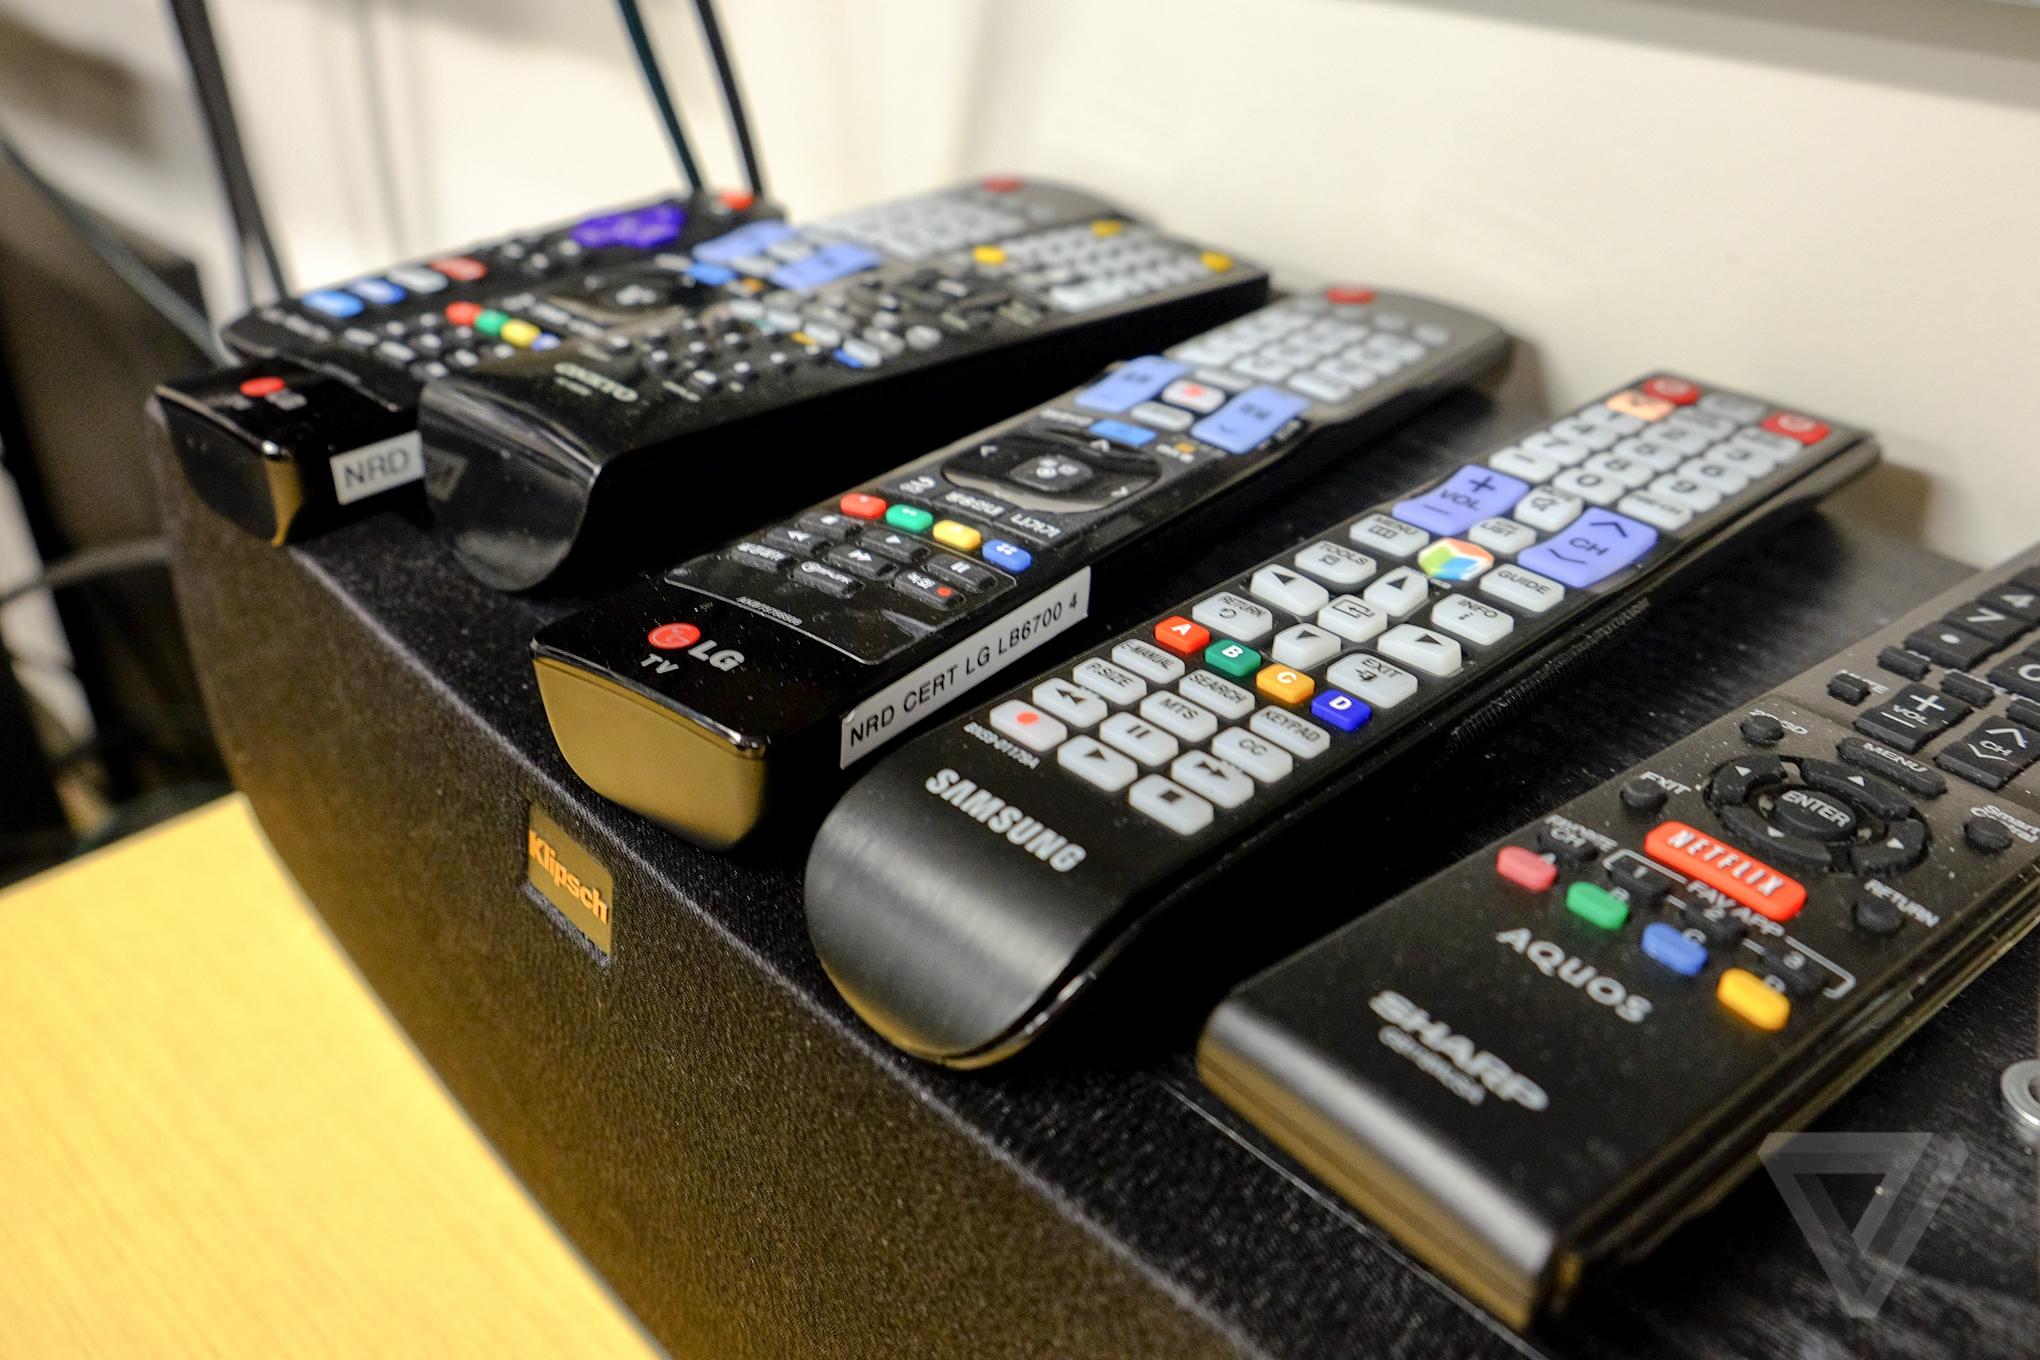 Netflix remotes